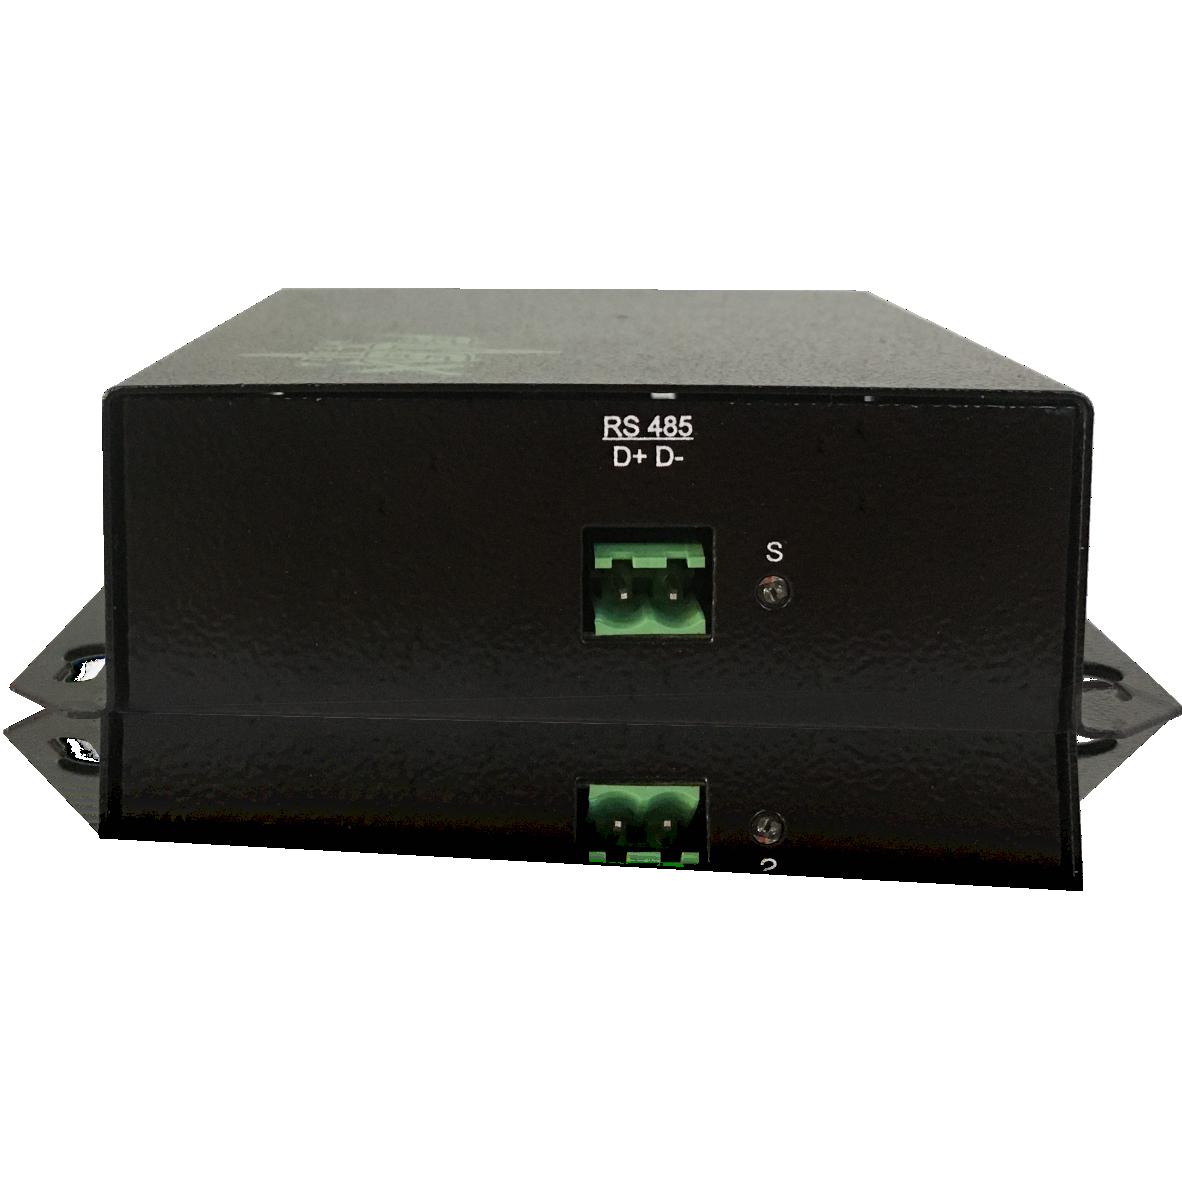 Conversor RS485-485 Opto-isolado